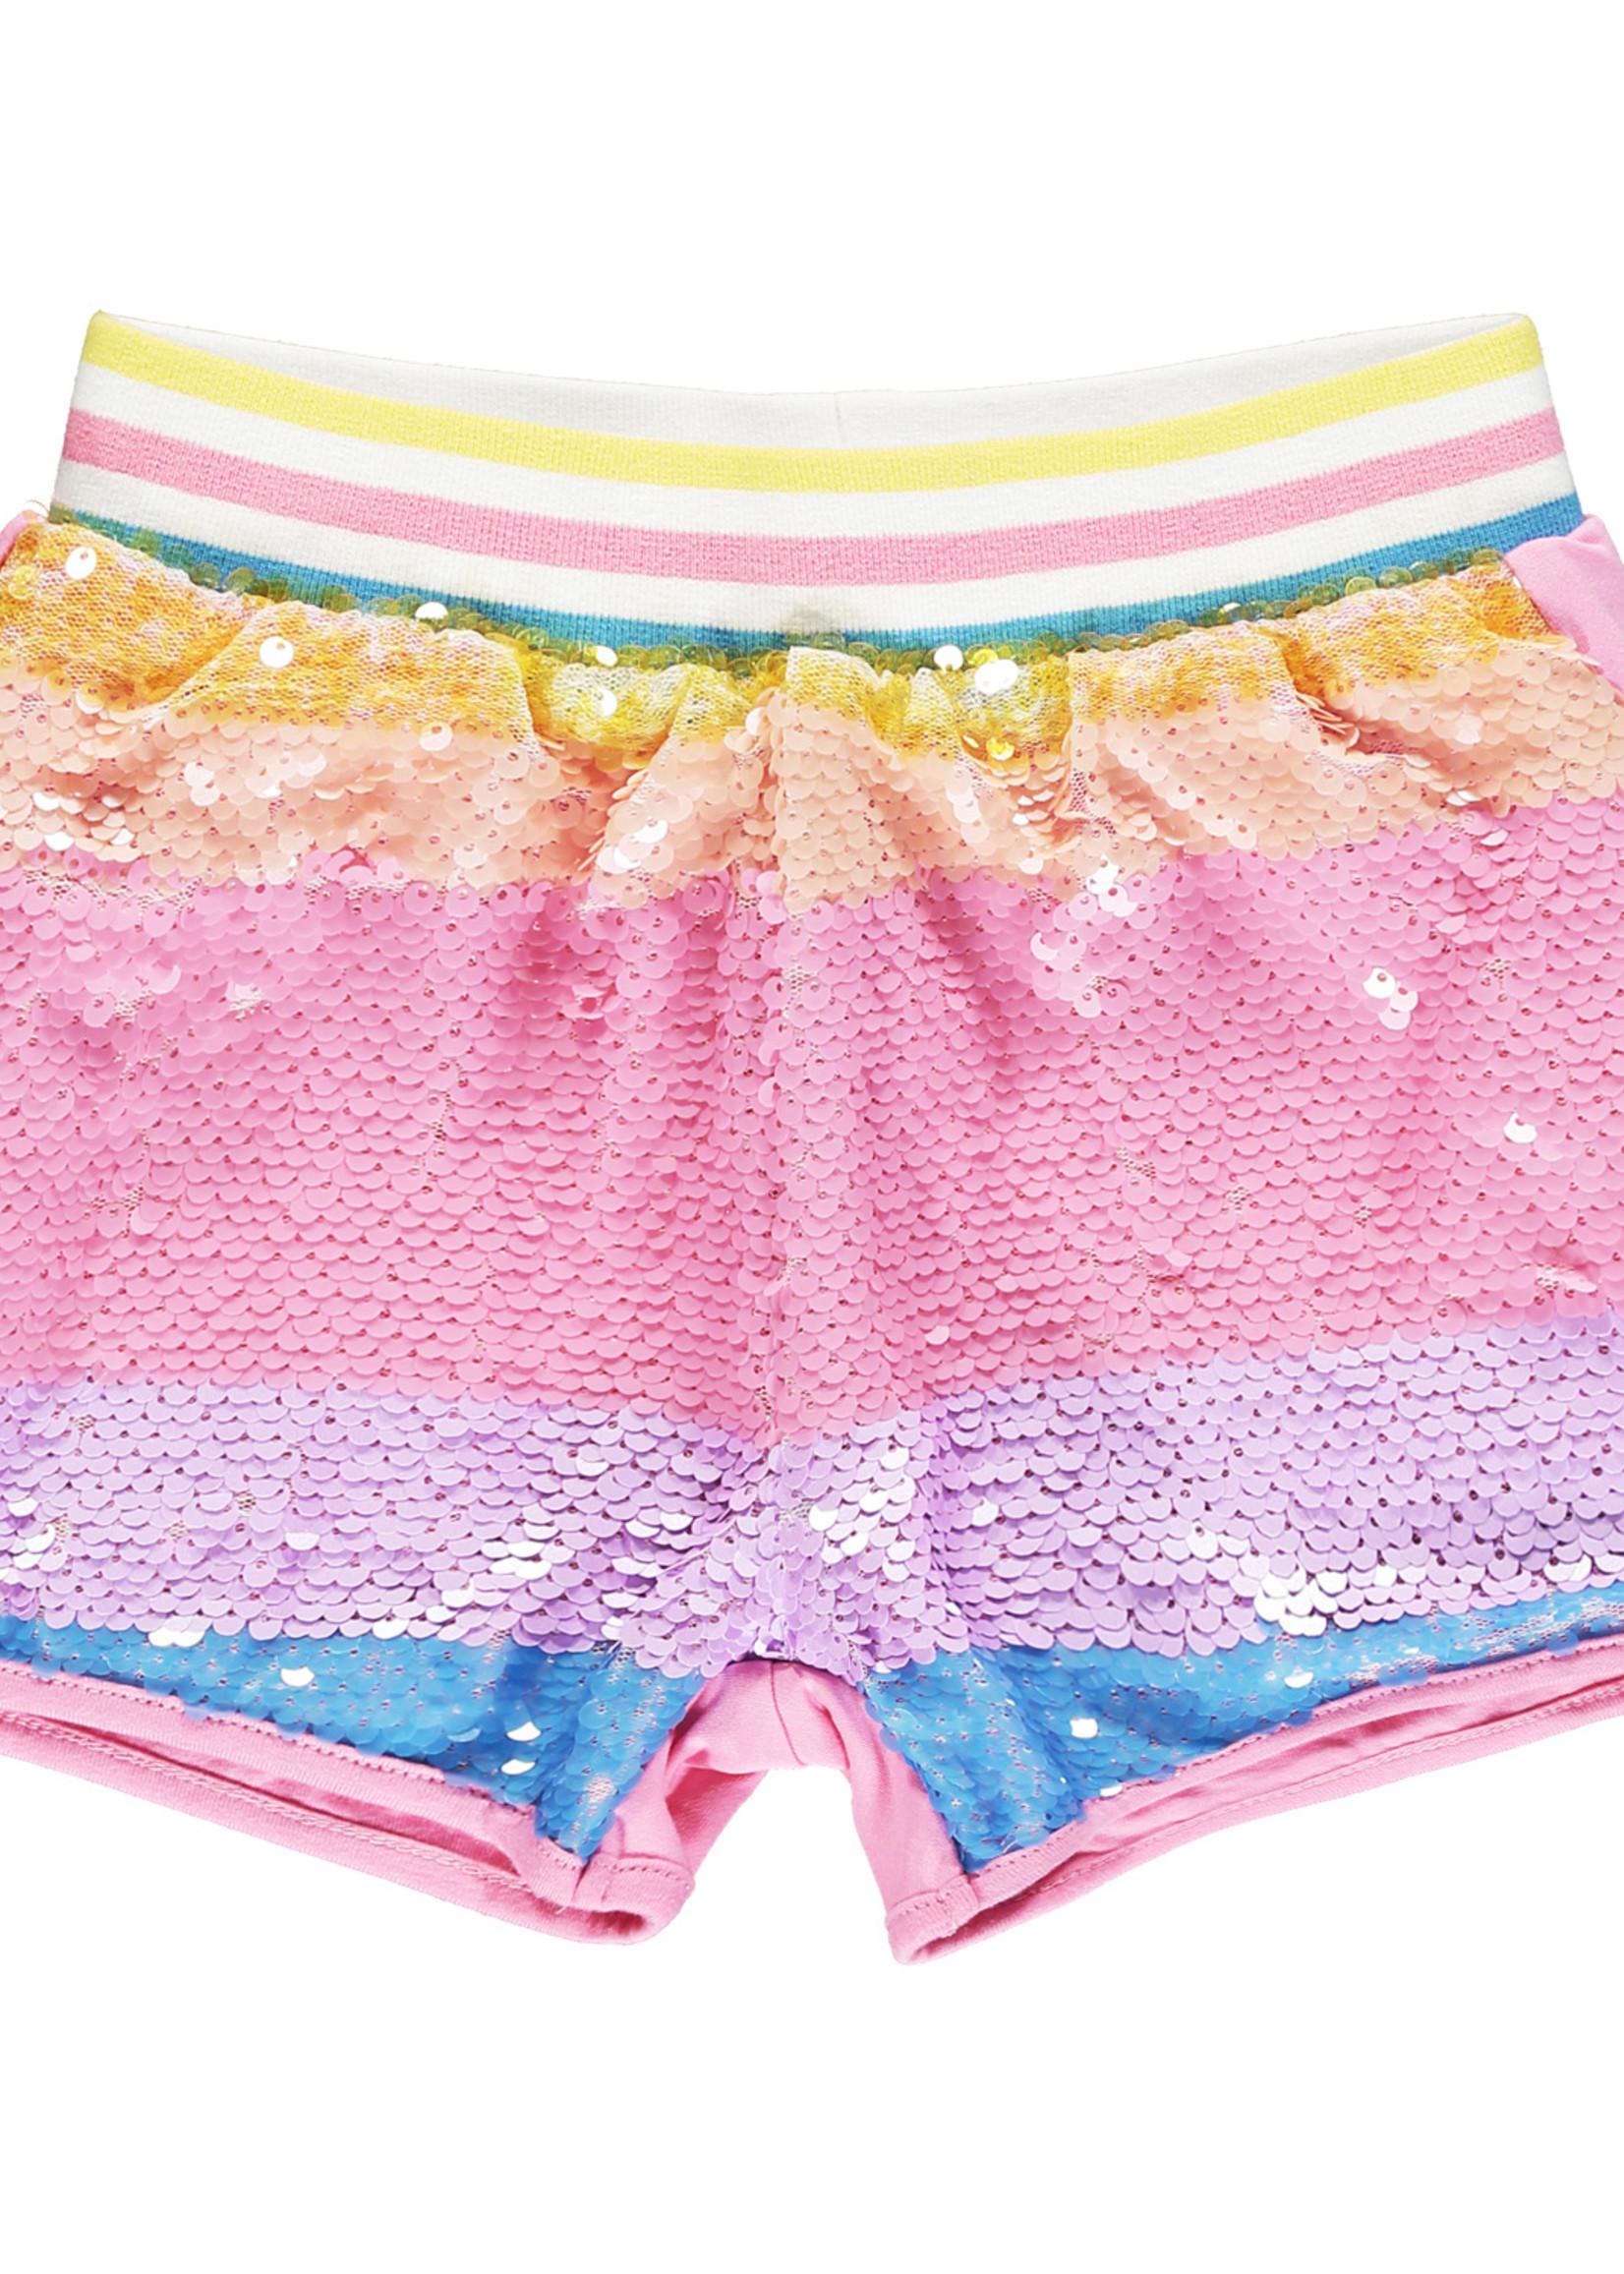 A Dee Norma 2 piece set rainbow sequin shorts